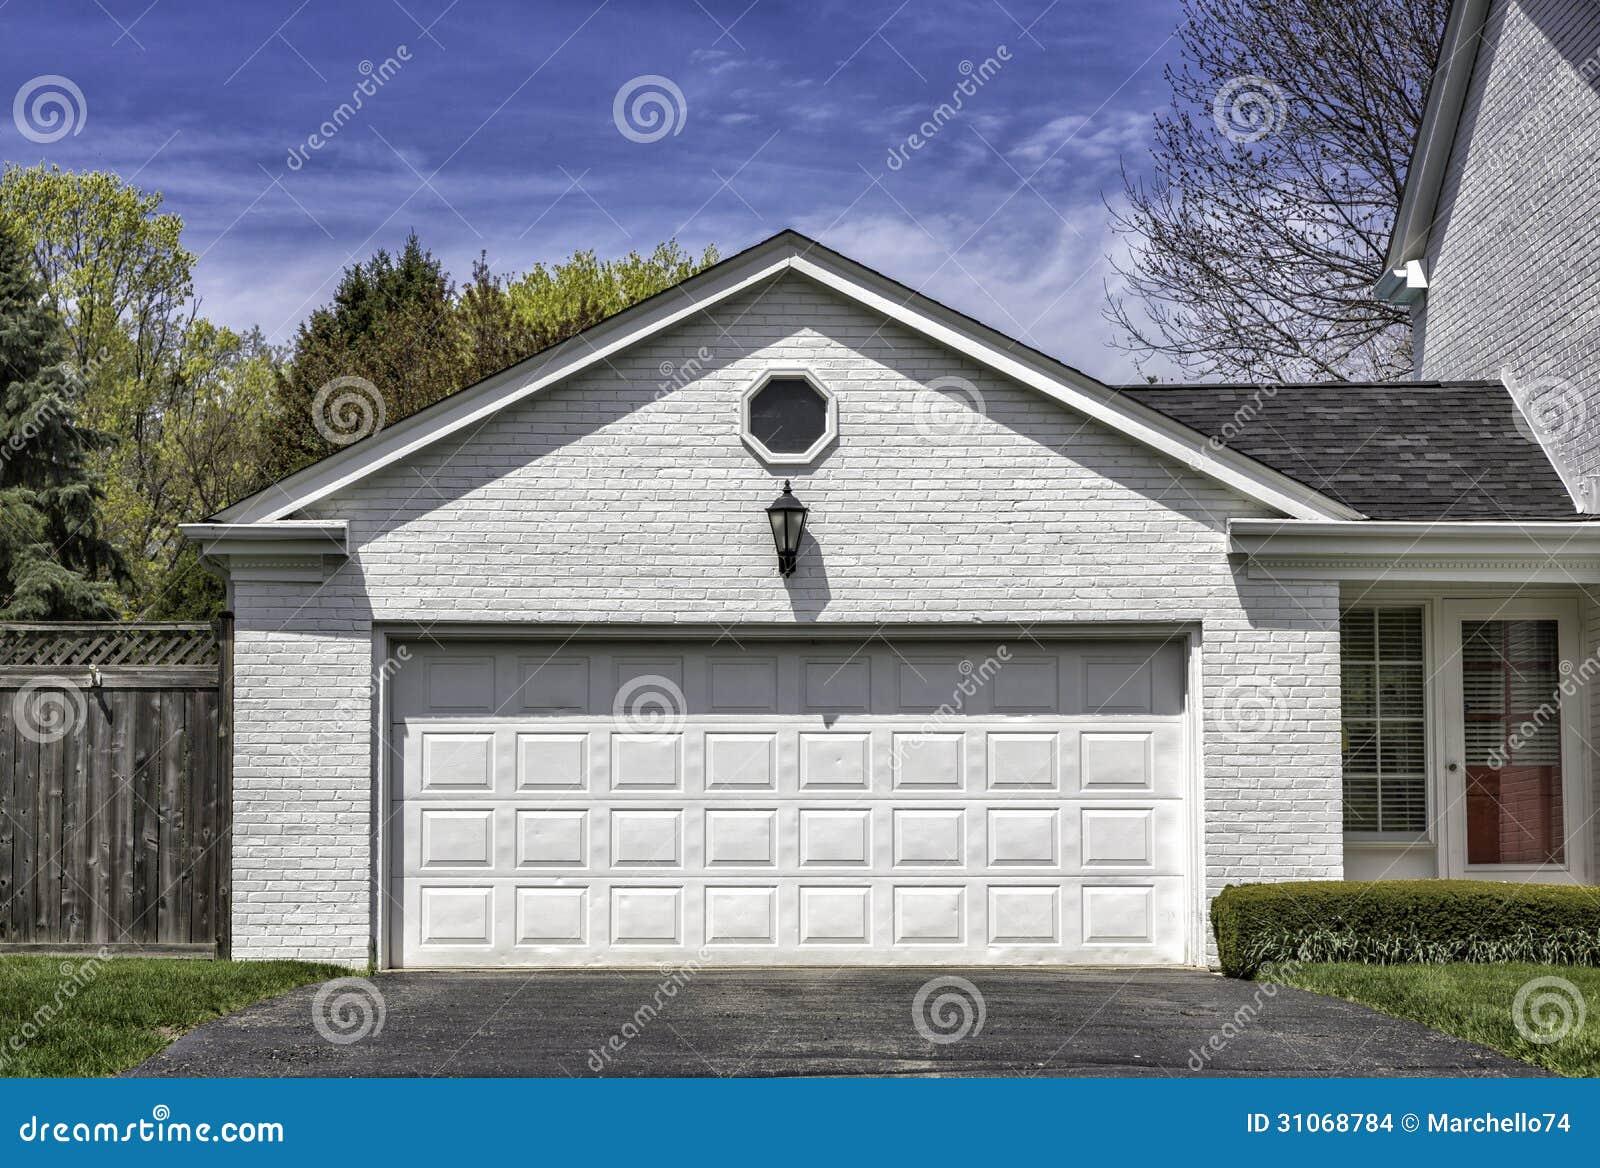 two car wooden garage stock photo image of panel old. Black Bedroom Furniture Sets. Home Design Ideas